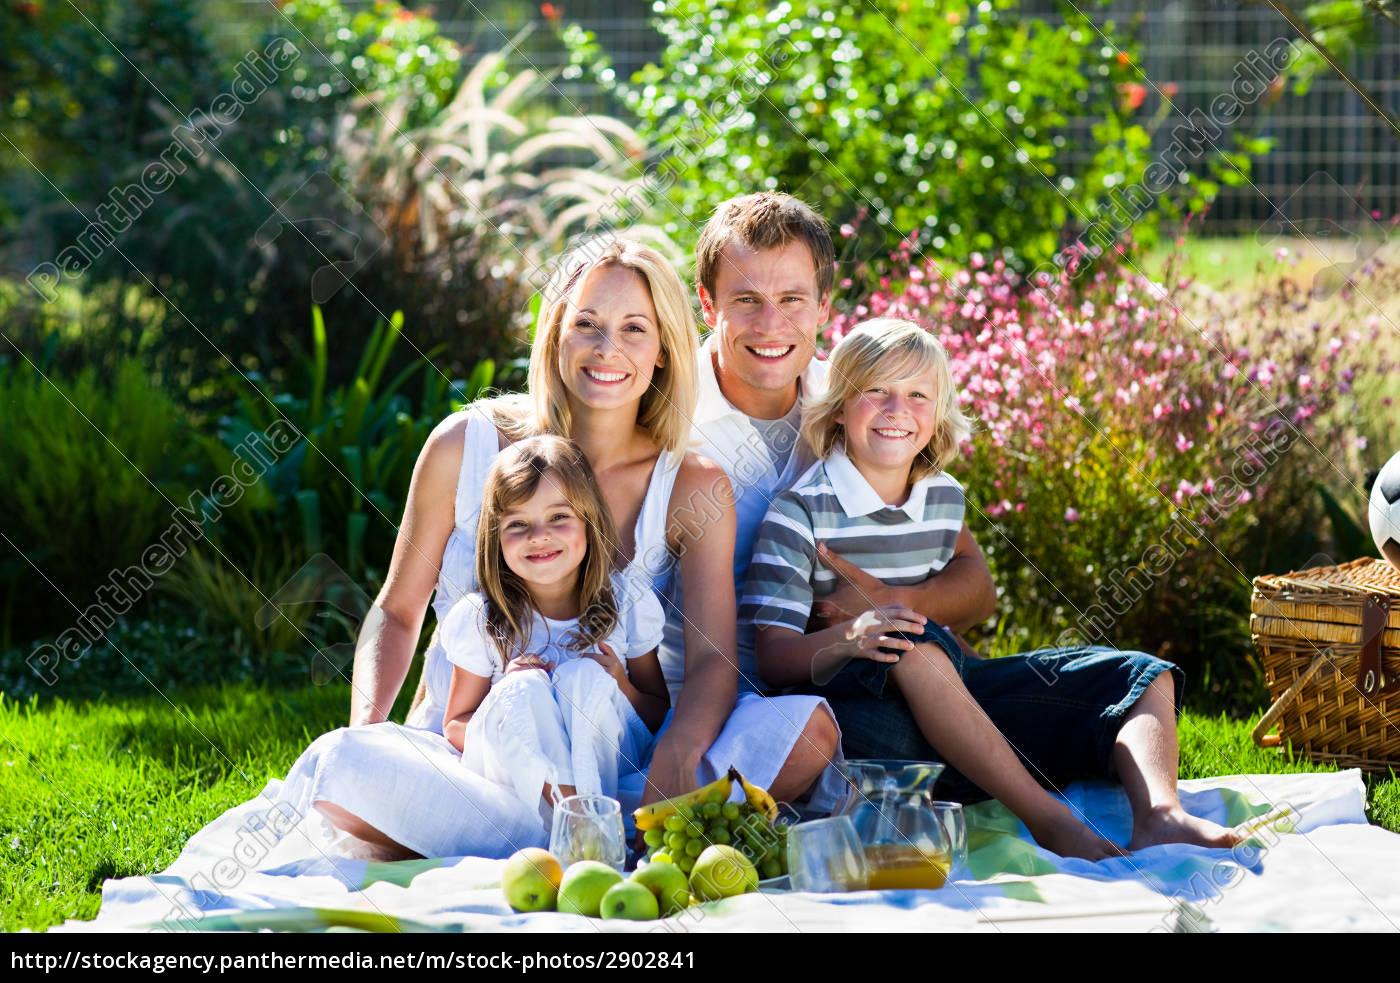 junge familie mit picknick im park lizenzfreies bild. Black Bedroom Furniture Sets. Home Design Ideas